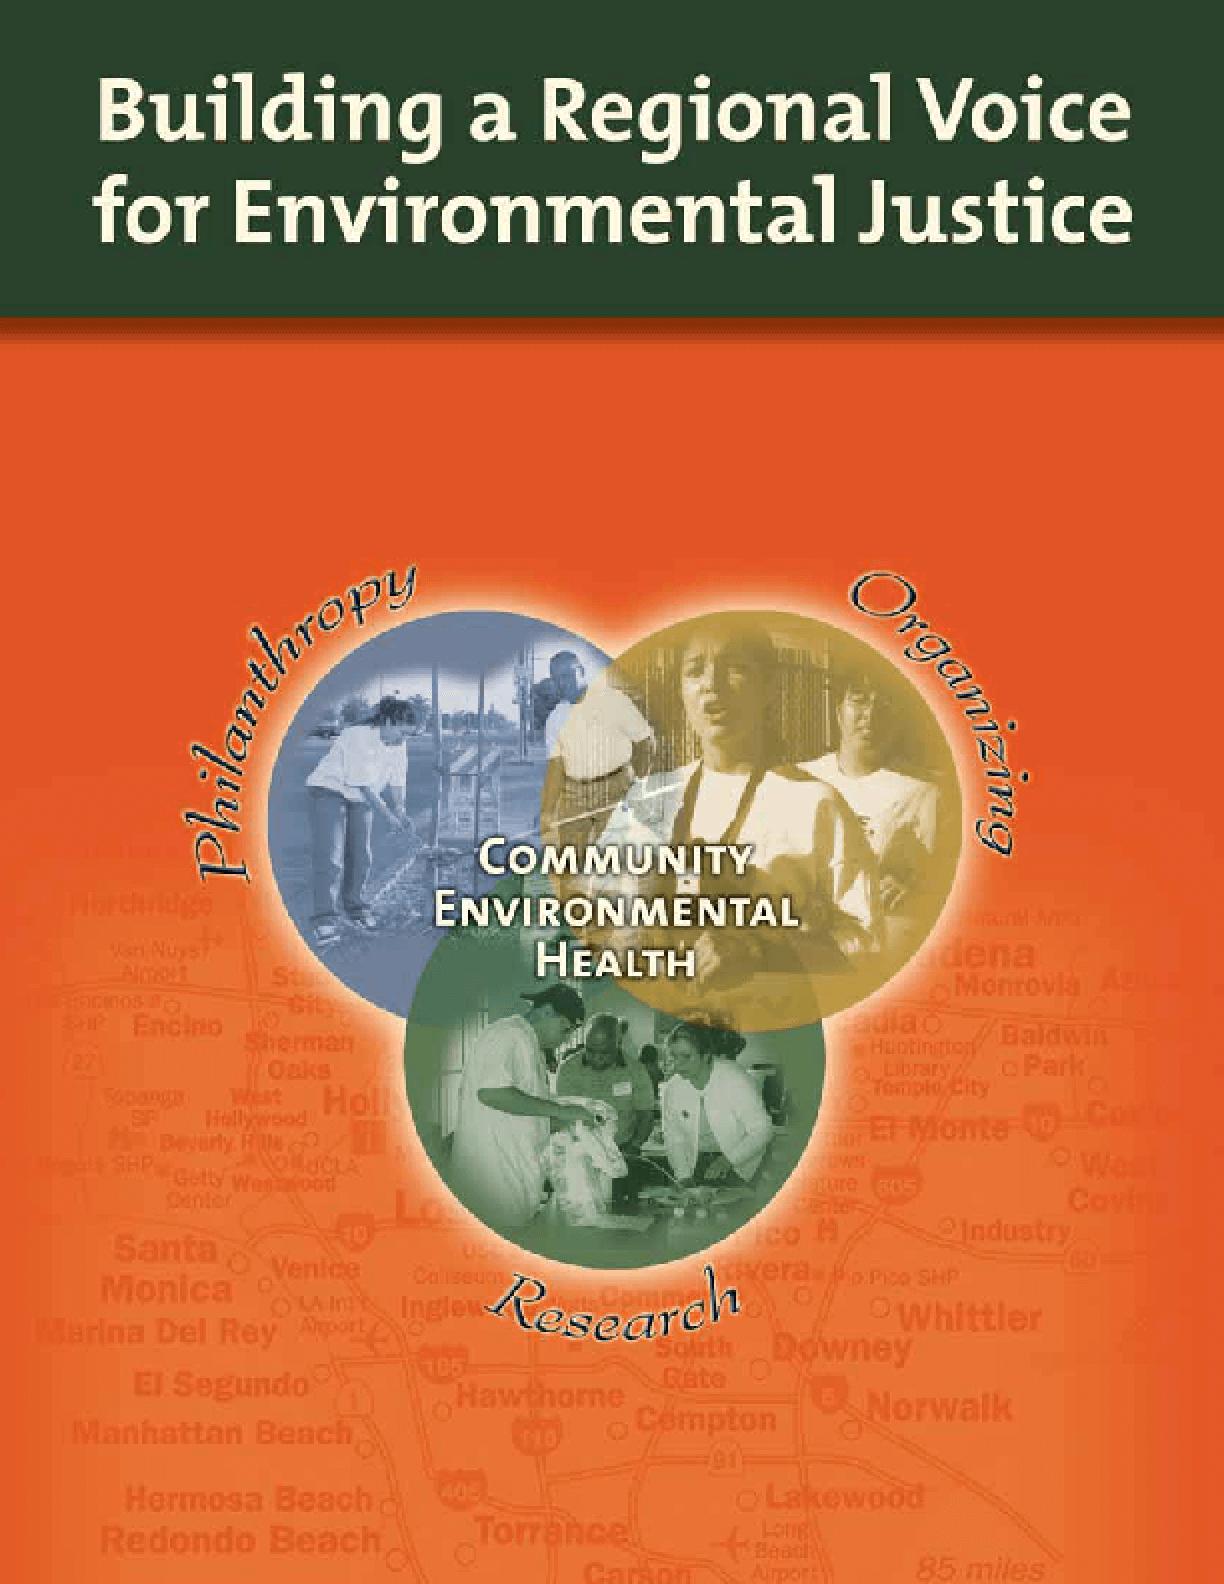 Building Healthy Communities in Environmental Justice Areas